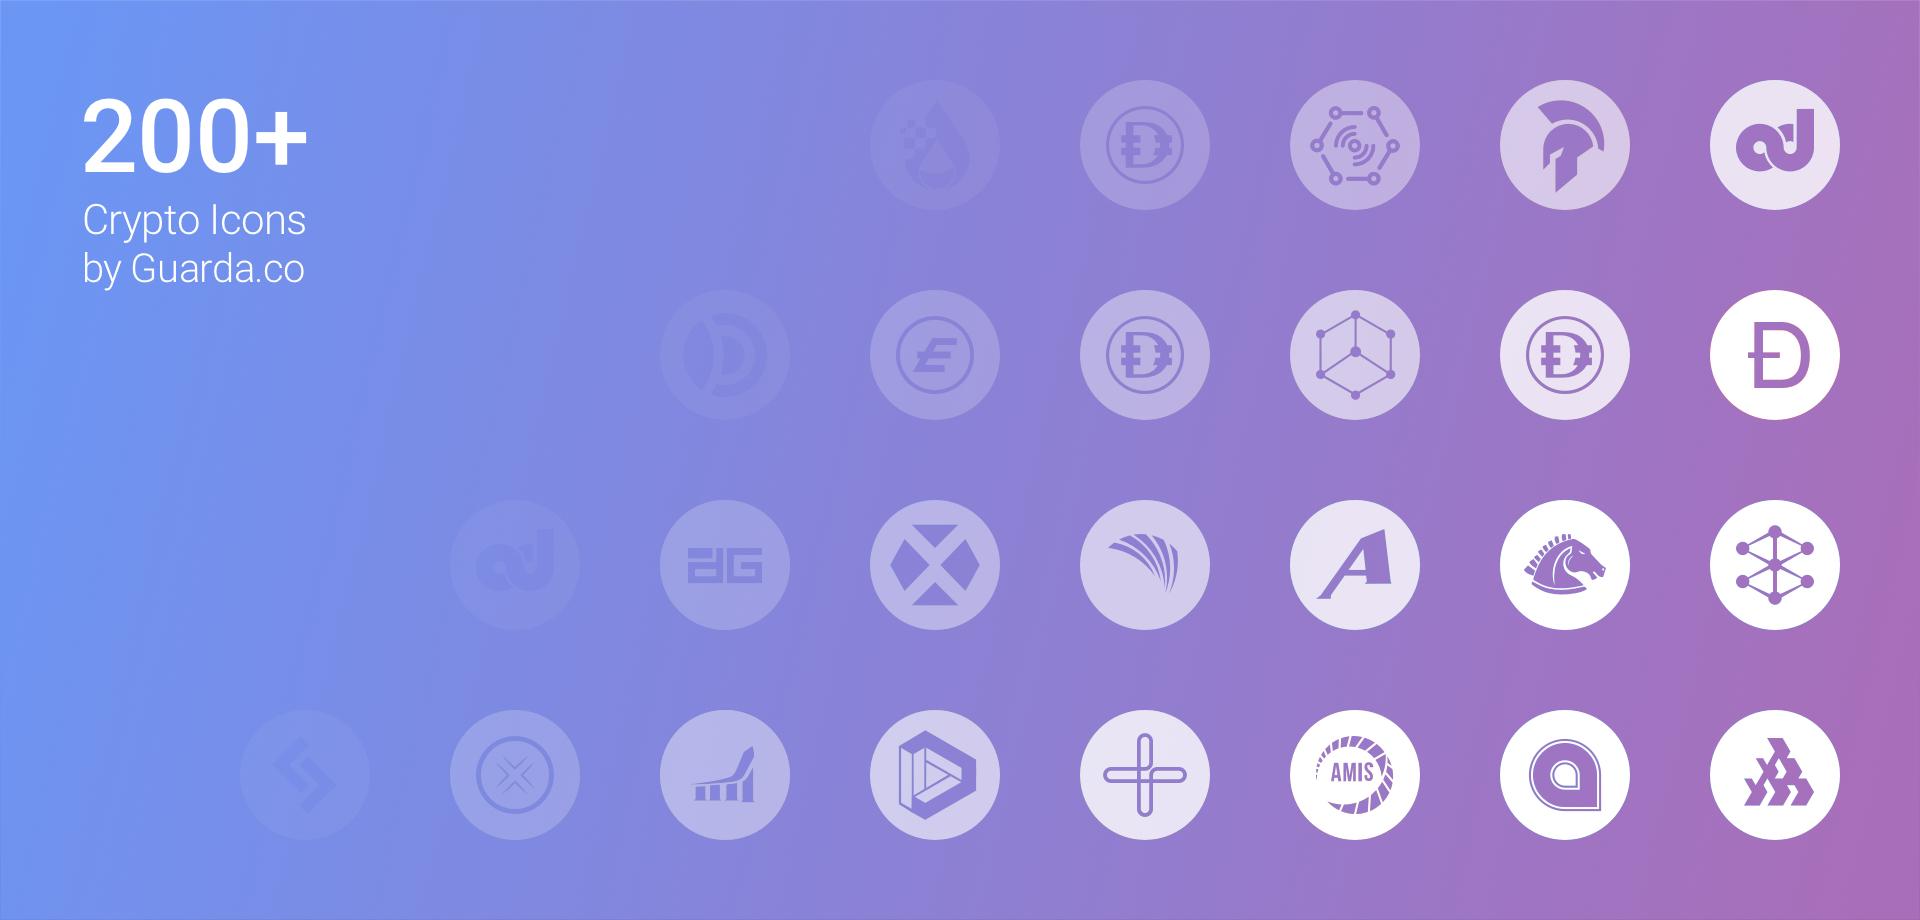 Guarda crypto icons